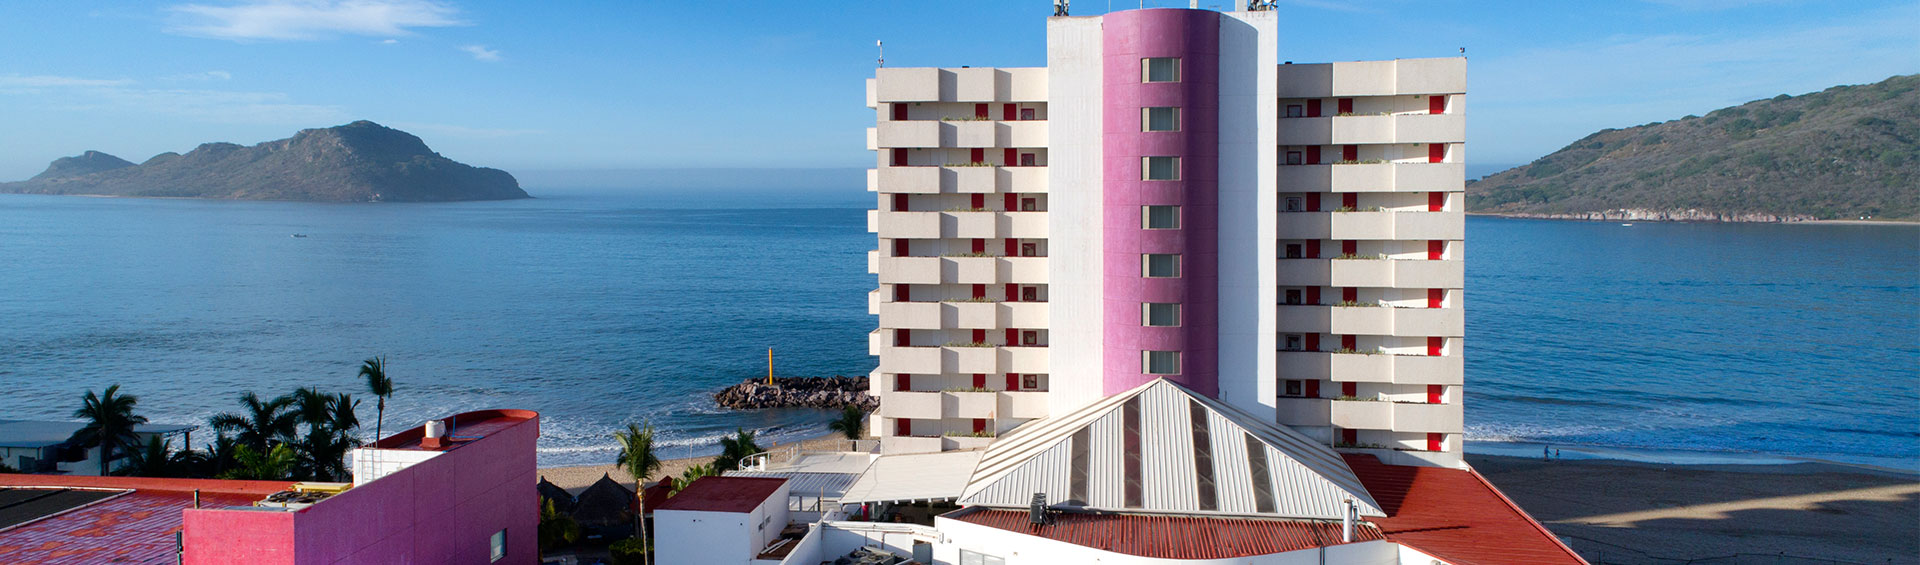 Mazatlan Mission - hoteles en mazatlan